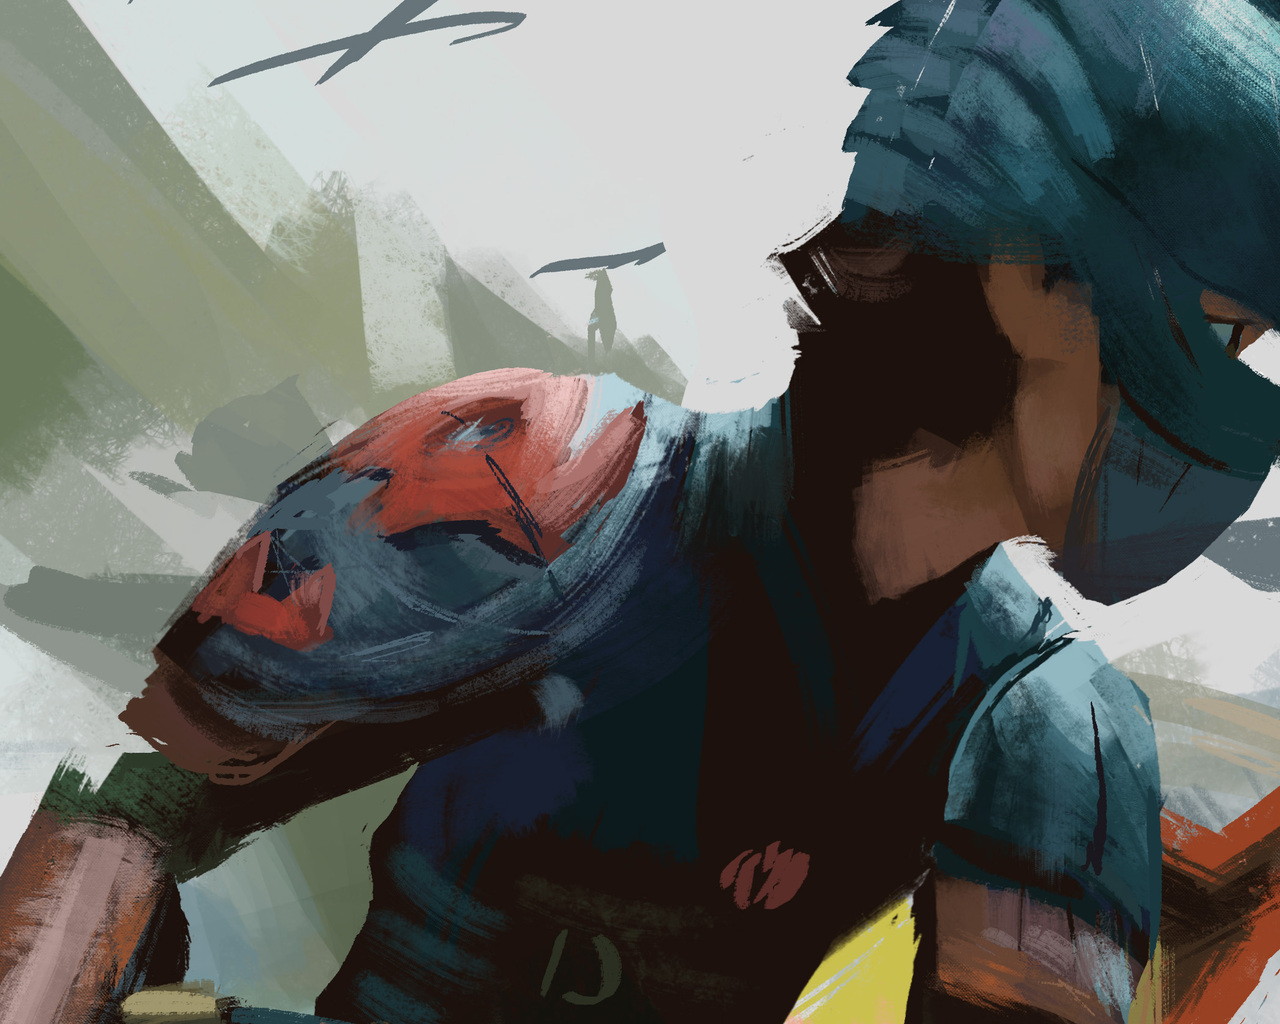 how-to-train-your-dragon-3-artistic-art-wg.jpg